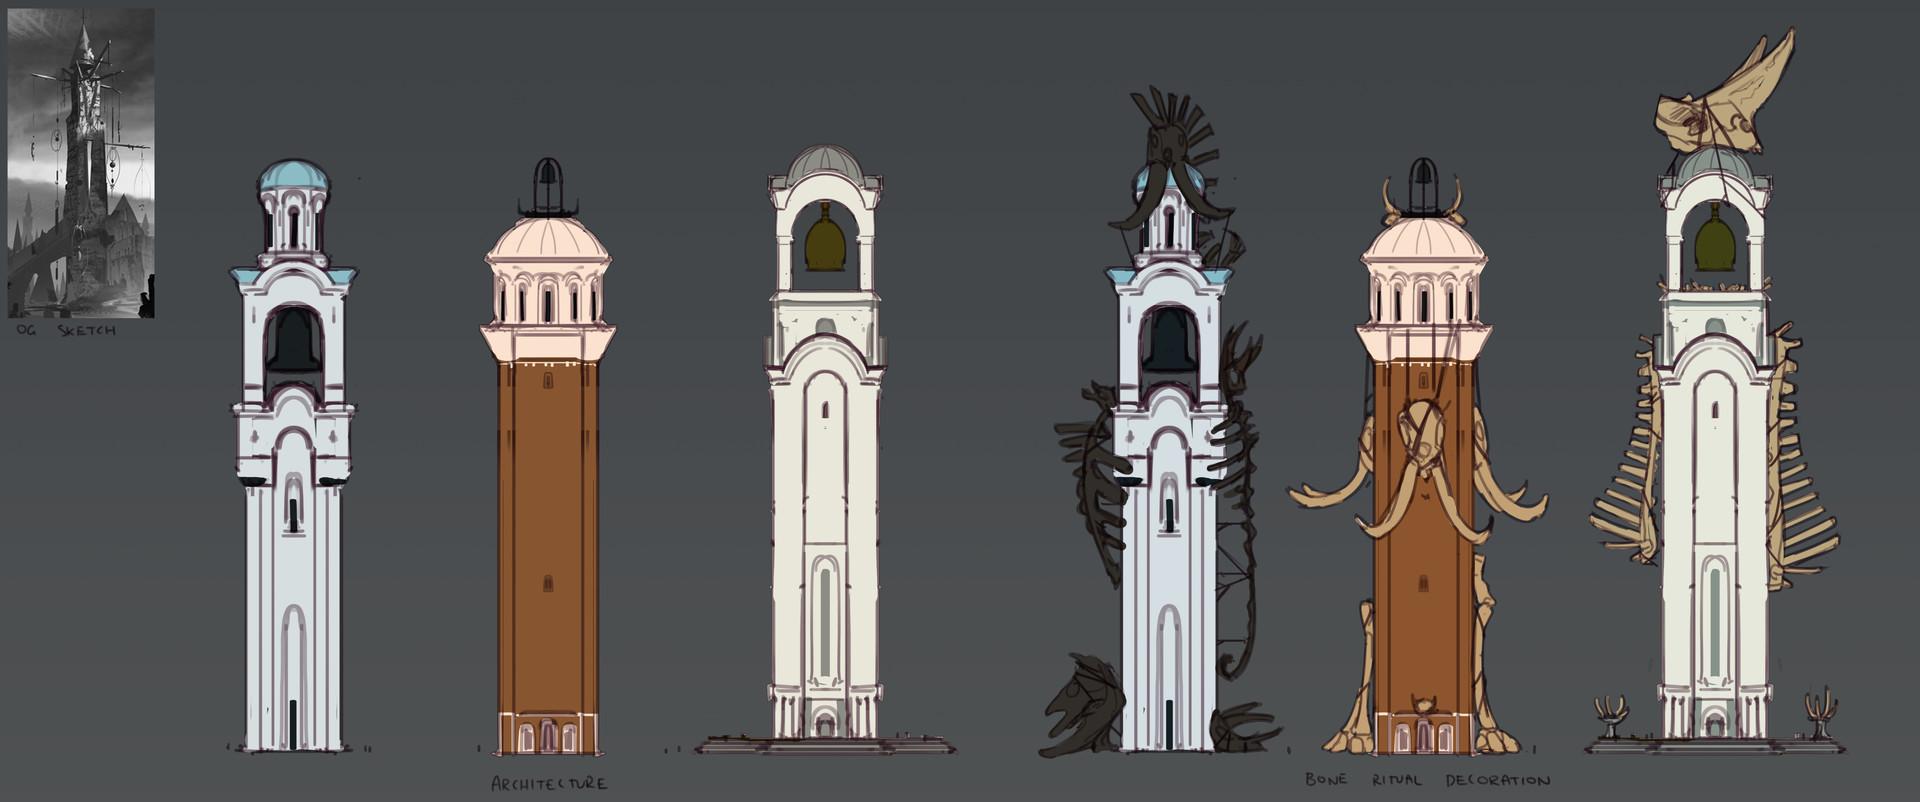 Nathan elmer necromancer tower